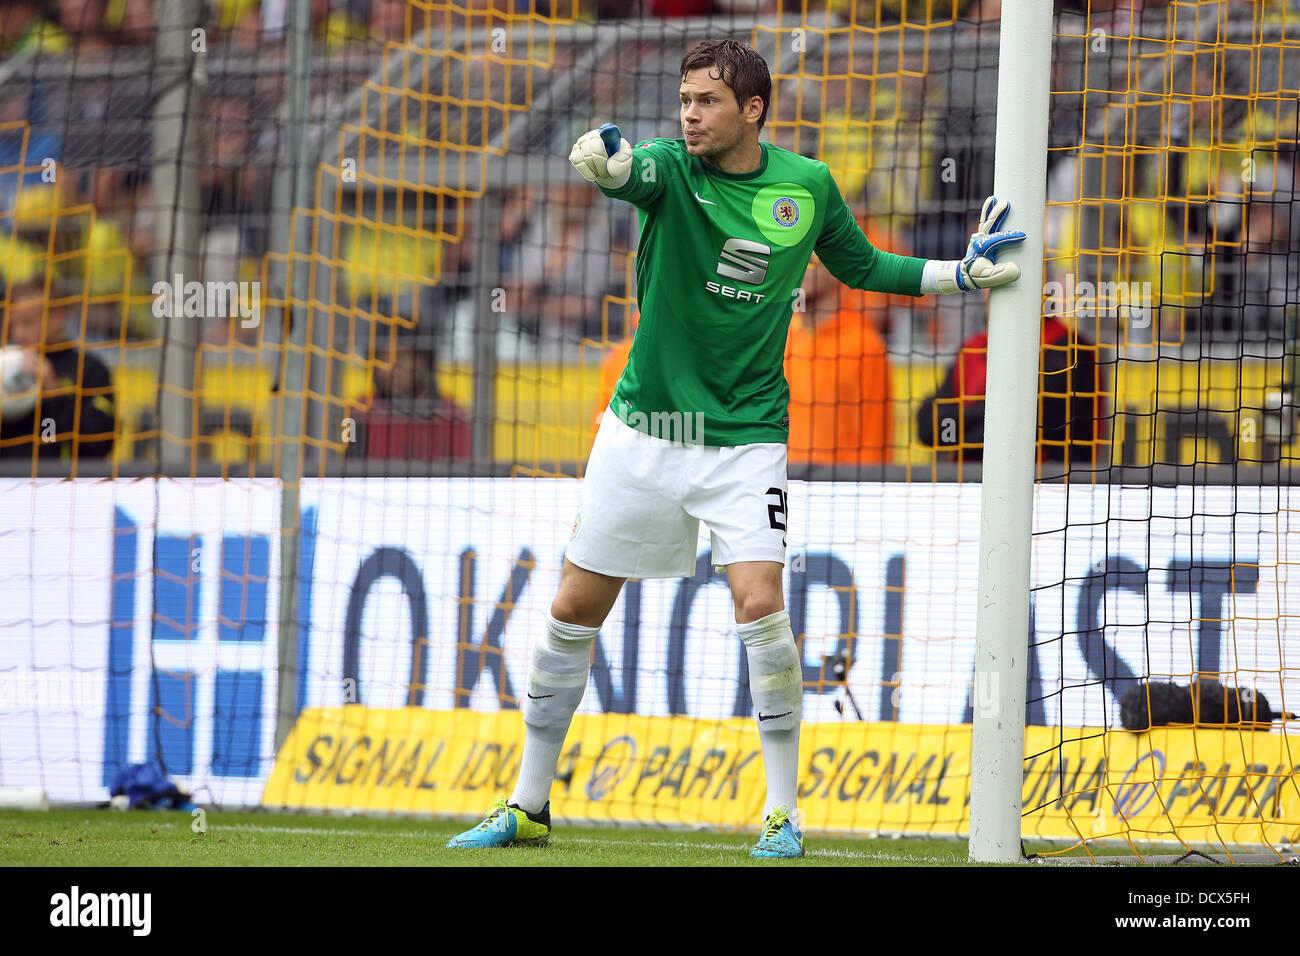 Braunschweig's goalkeeper Daniel Davari in action during the German Bundesliga match between Borussia Dortmund - Stock Image